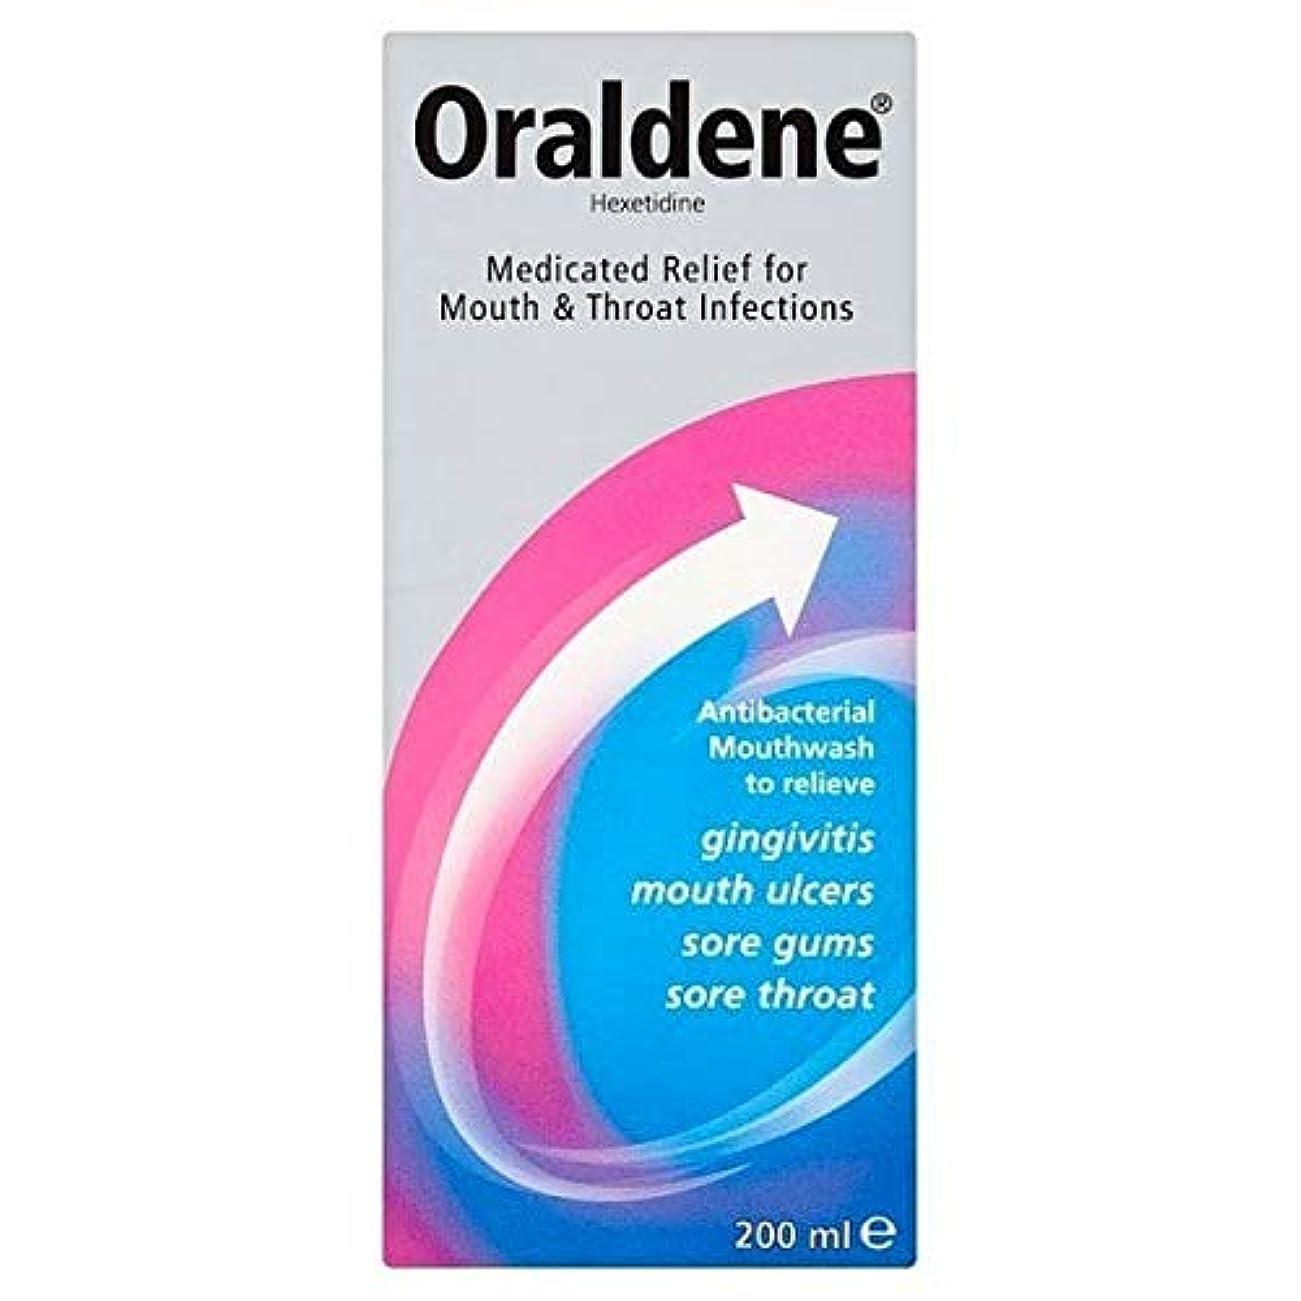 [Oraldene] Oraldeneマウスウォッシュ200ミリリットル - Oraldene Mouthwash 200ml [並行輸入品]